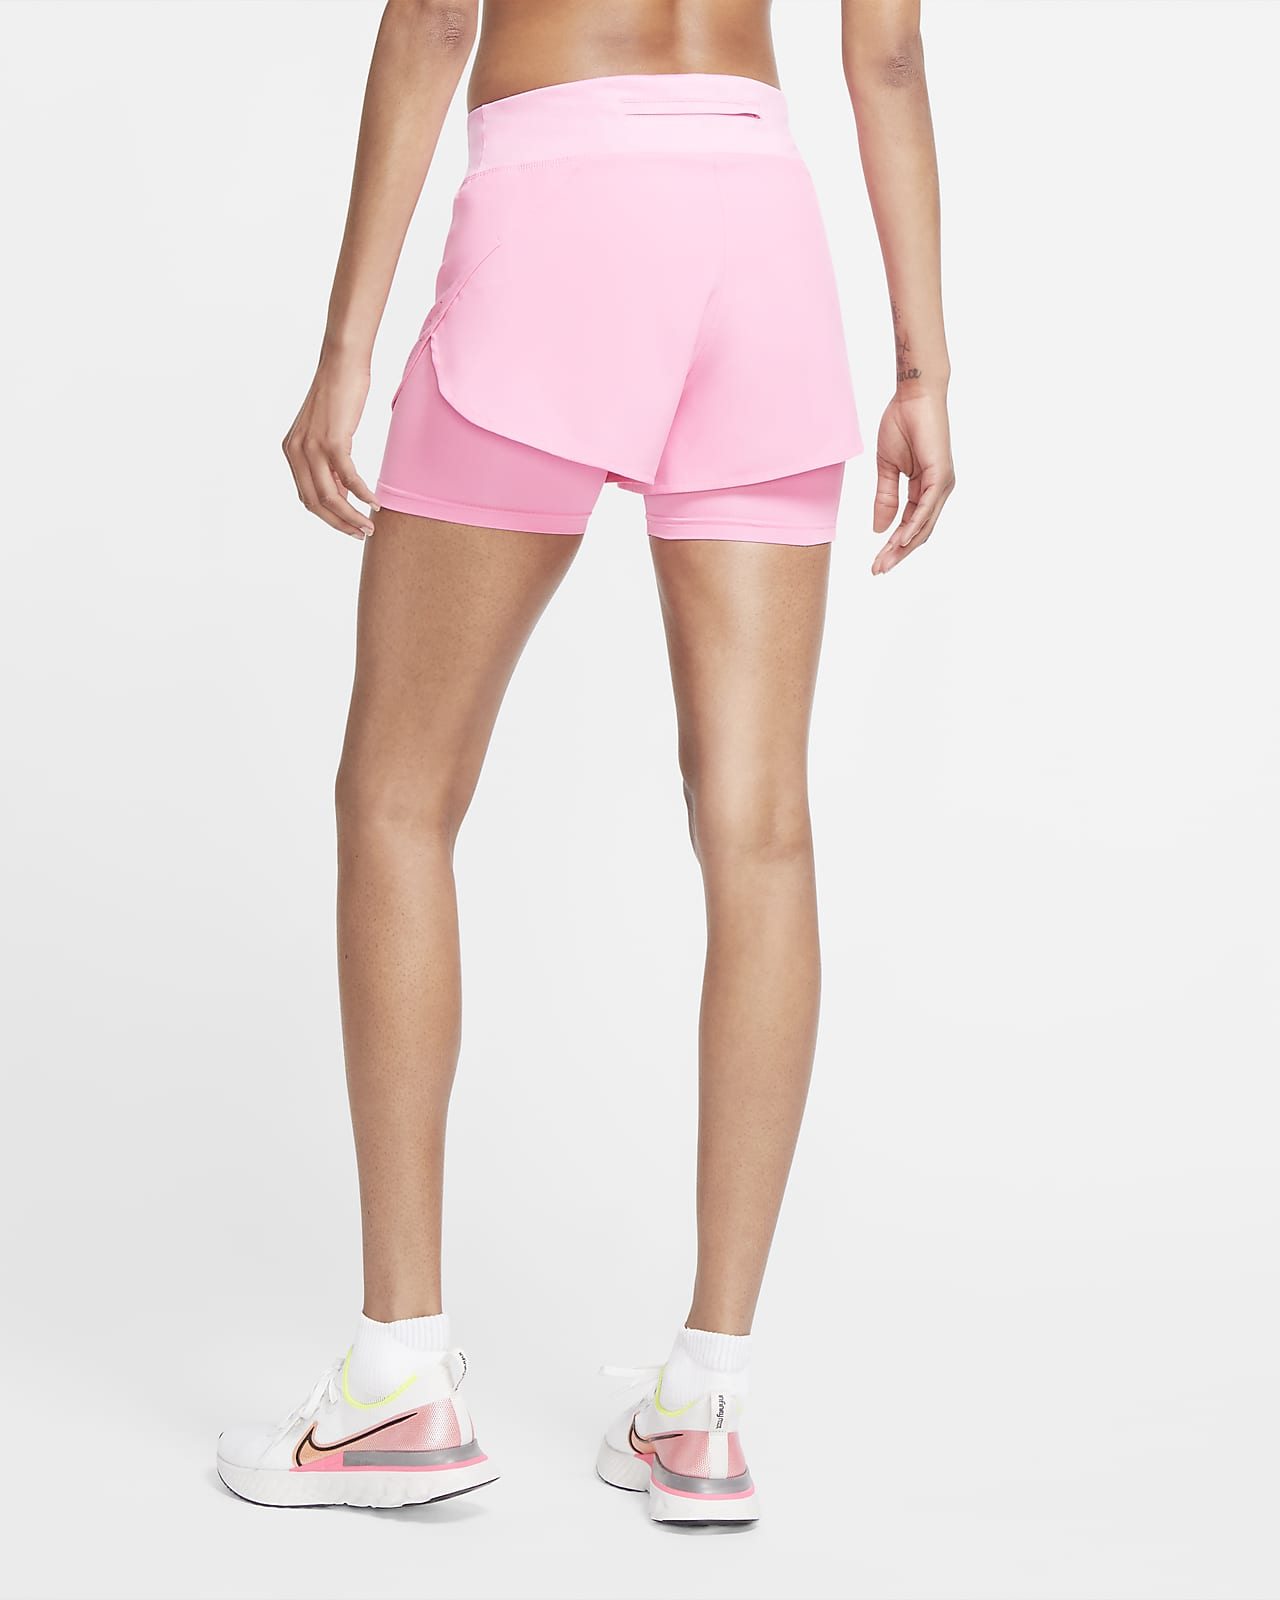 Nike Eclipse Pantalon Corto De Running 2 En 1 Mujer Nike Es